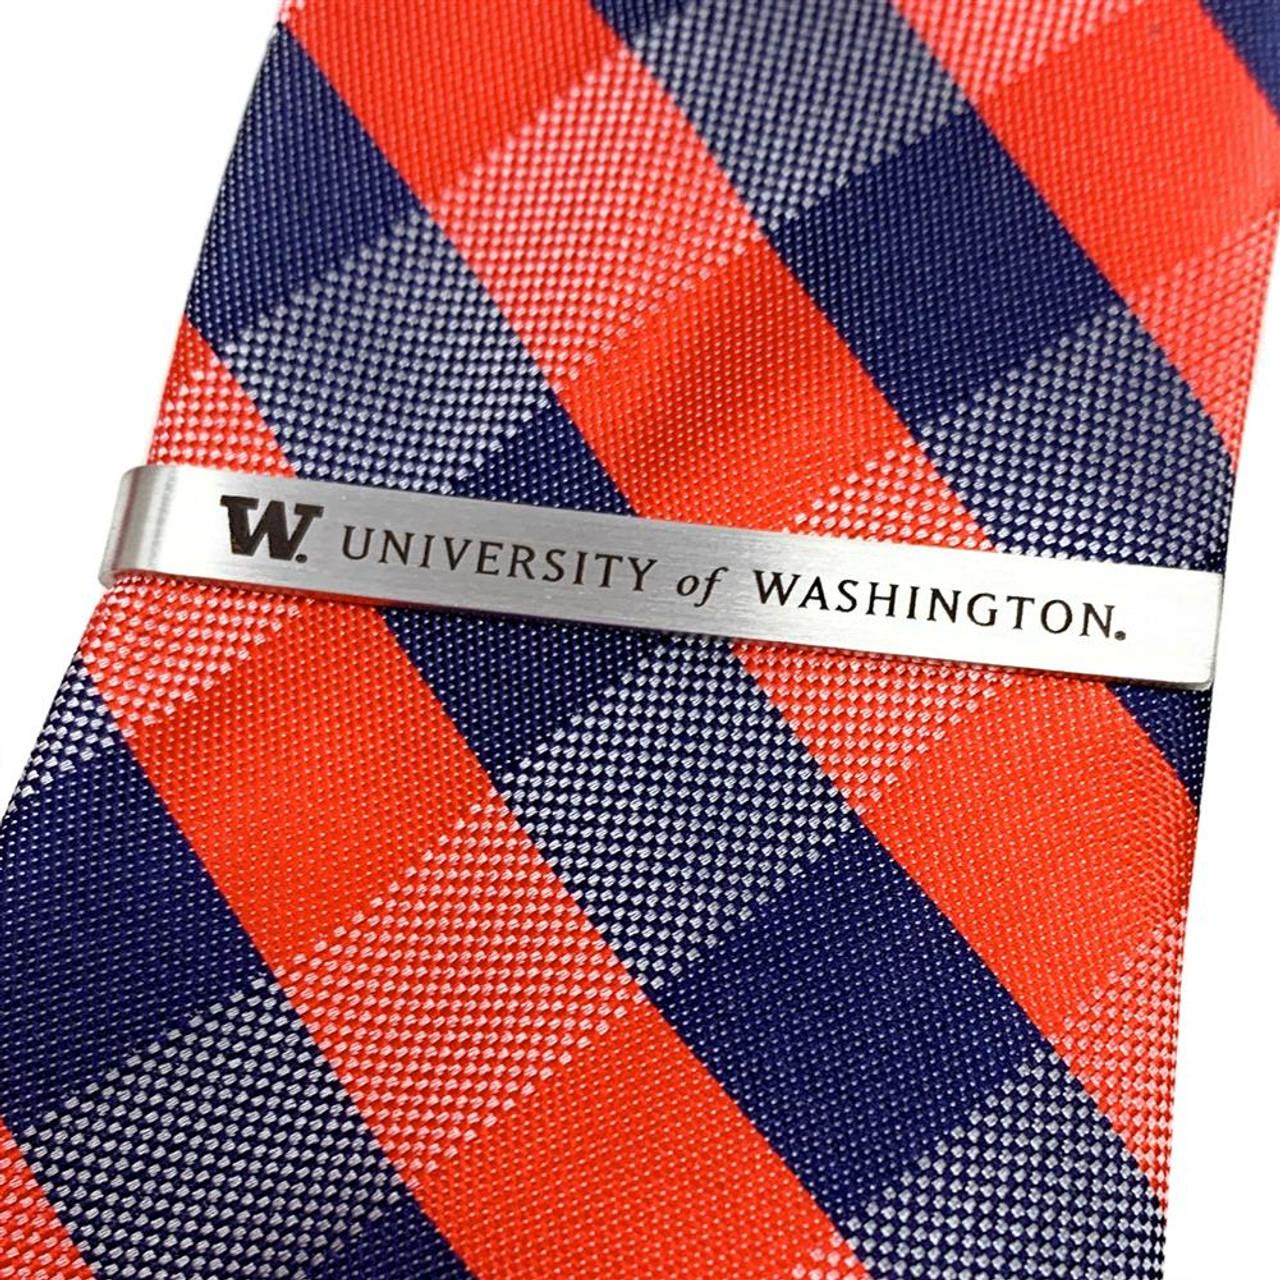 Kansas State University Tie Clip Silver Tie Bar Gift Set